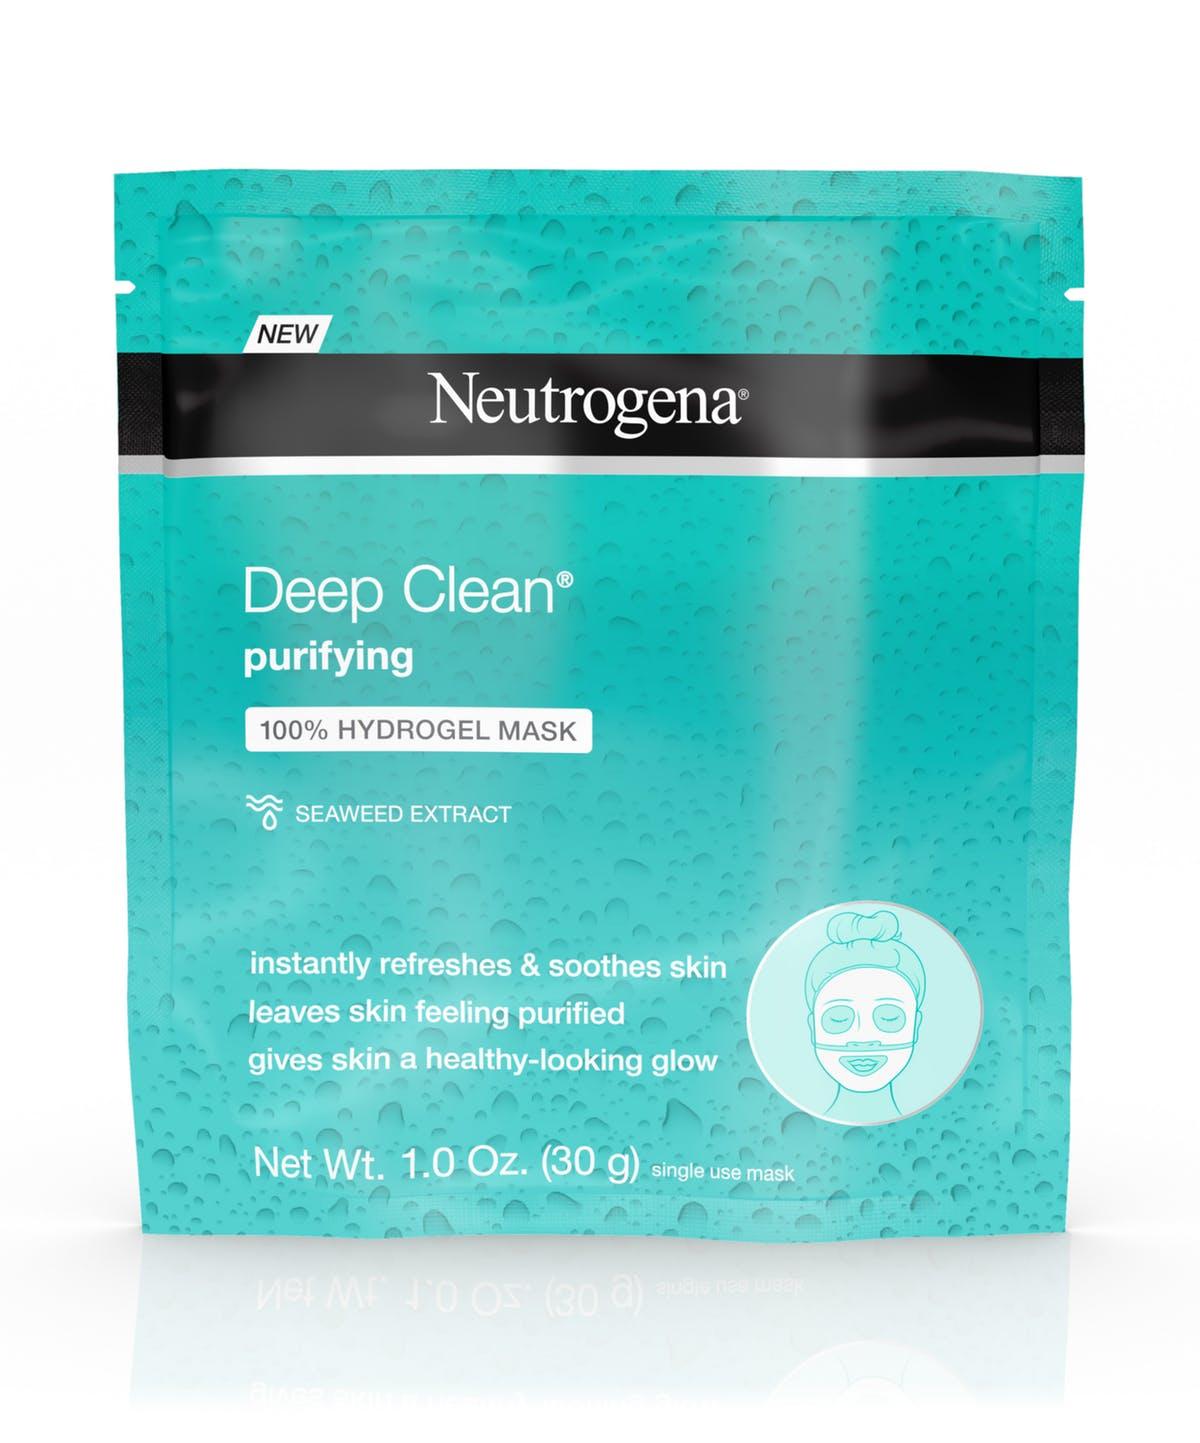 Neutrogena Deep Clean Purifying Hydrogel Face Mask